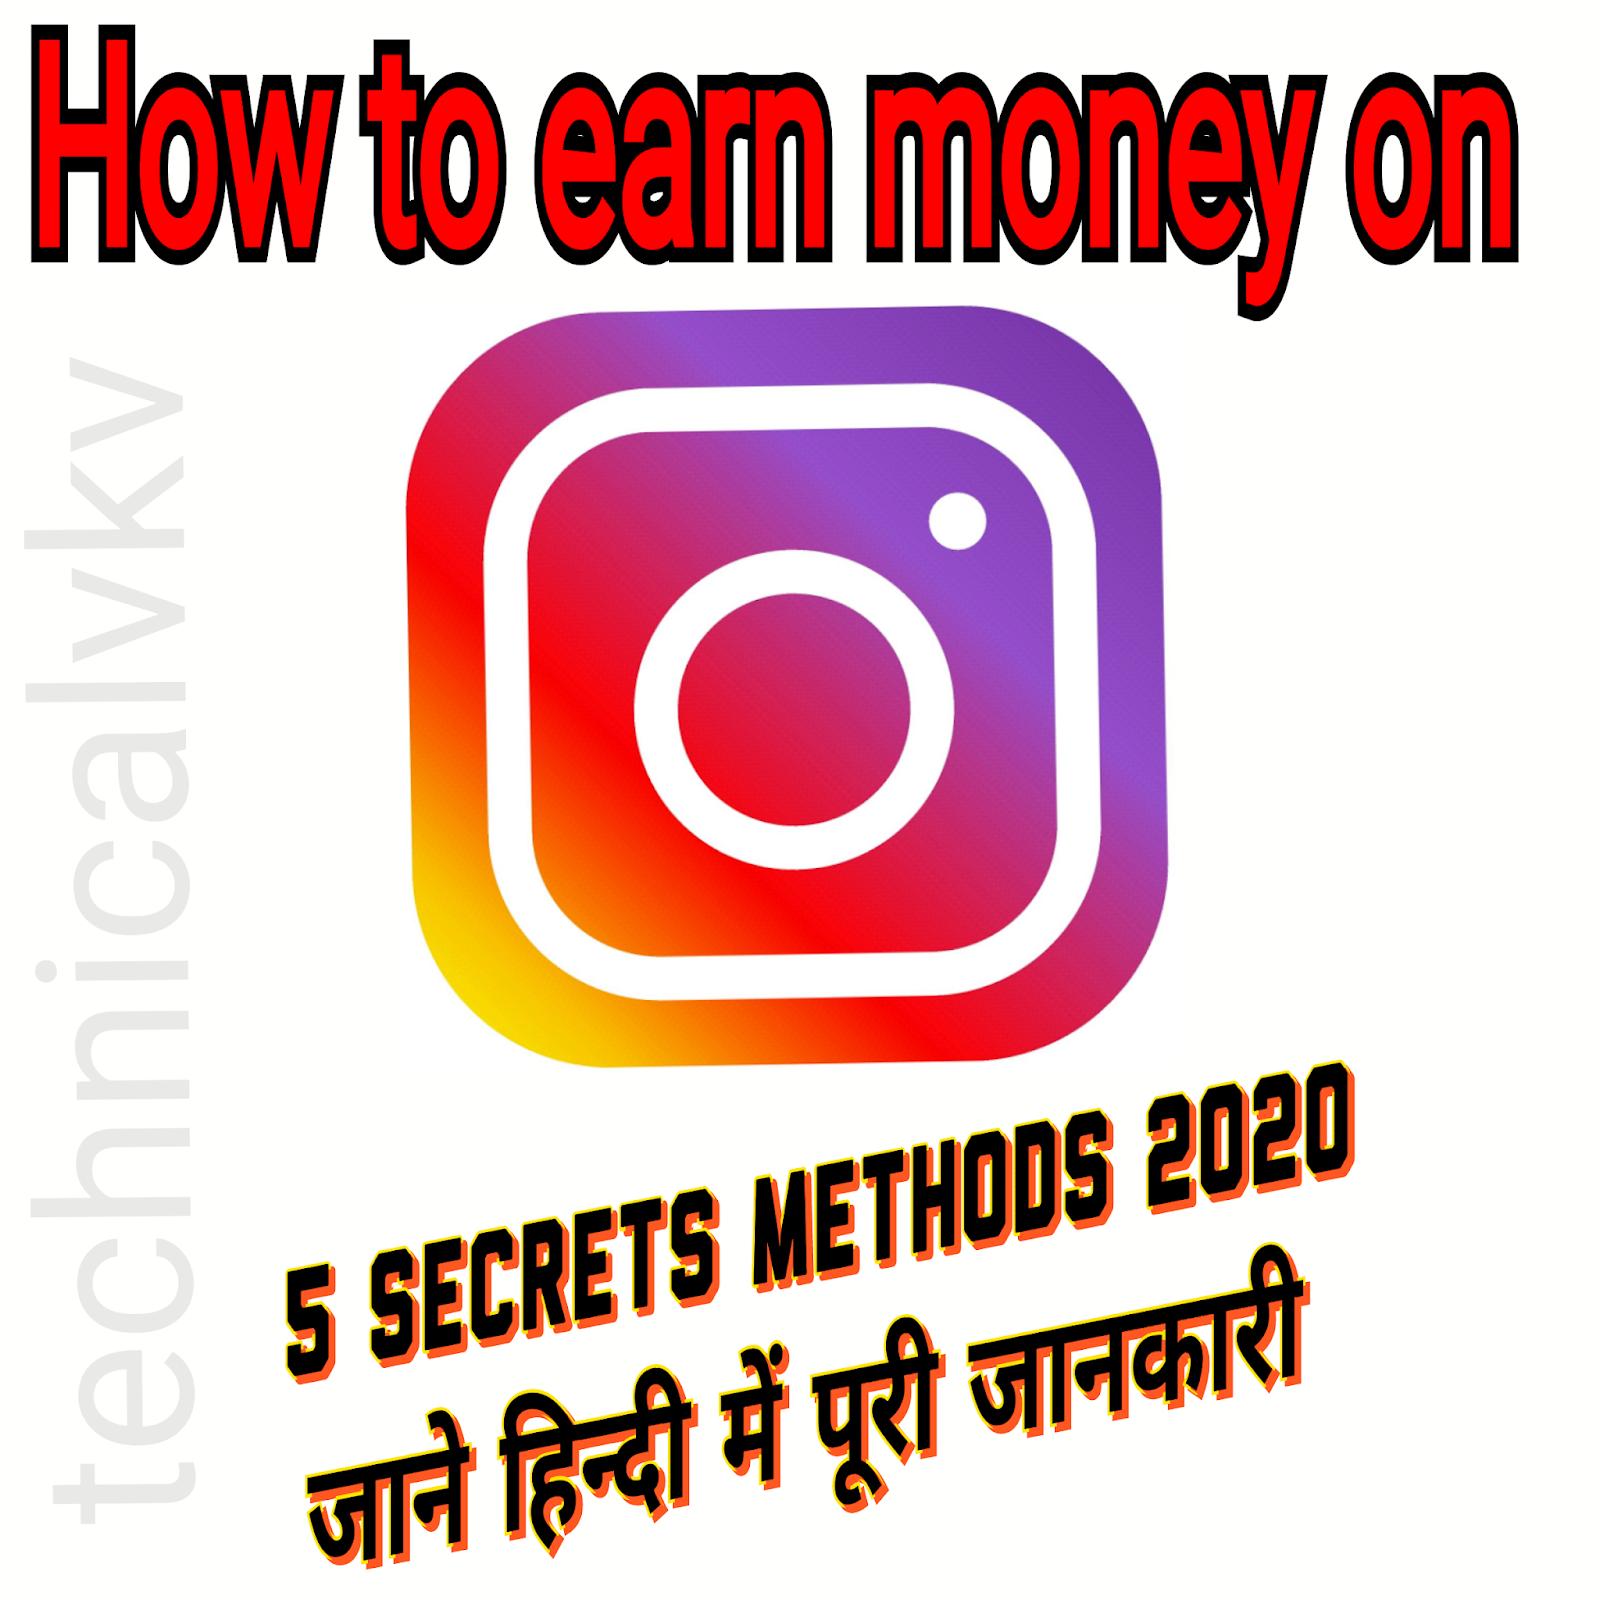 How to earn money on Instagram 5 Secrets 2020 जाने हिन्दी में पूरी जानकारी